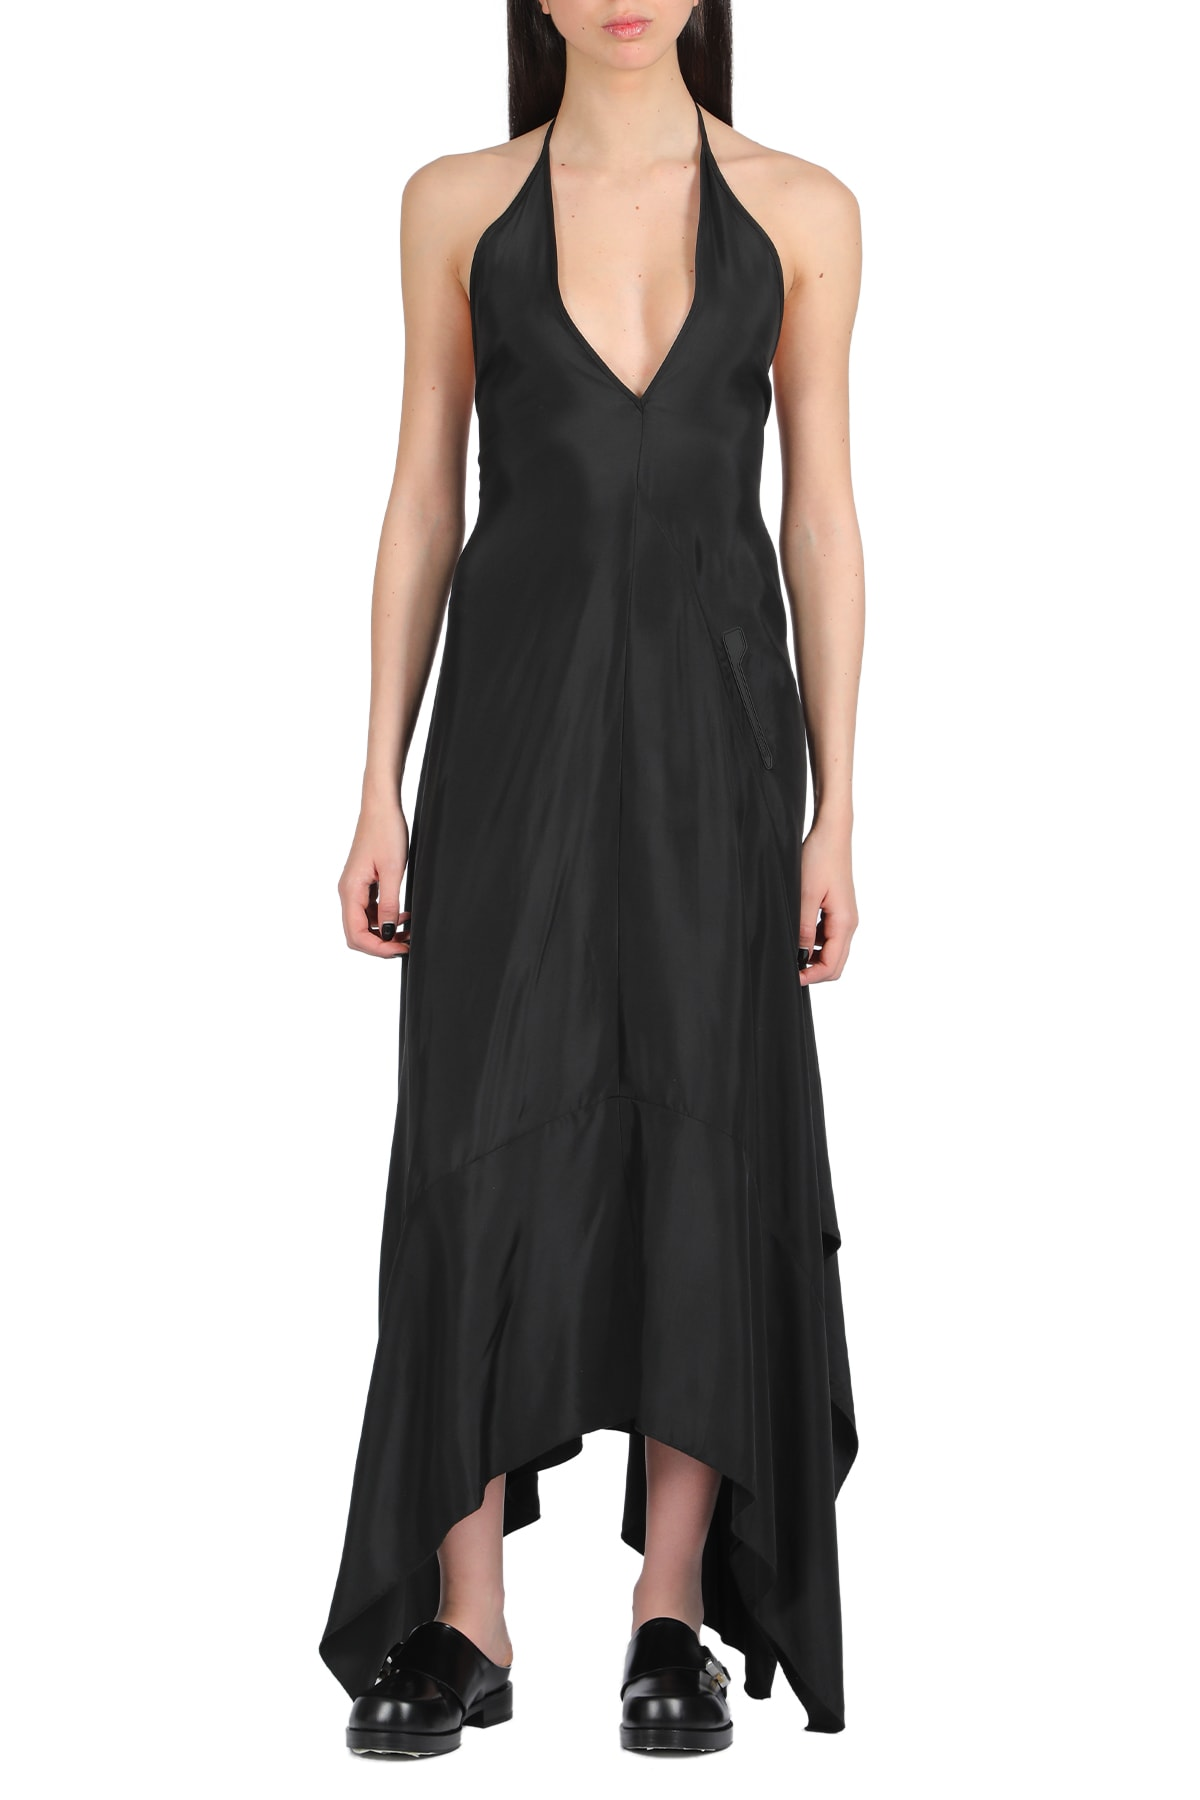 Buy 1017 Alyx 9sm Vulcano Dress online, shop 1017 ALYX 9SM with free shipping